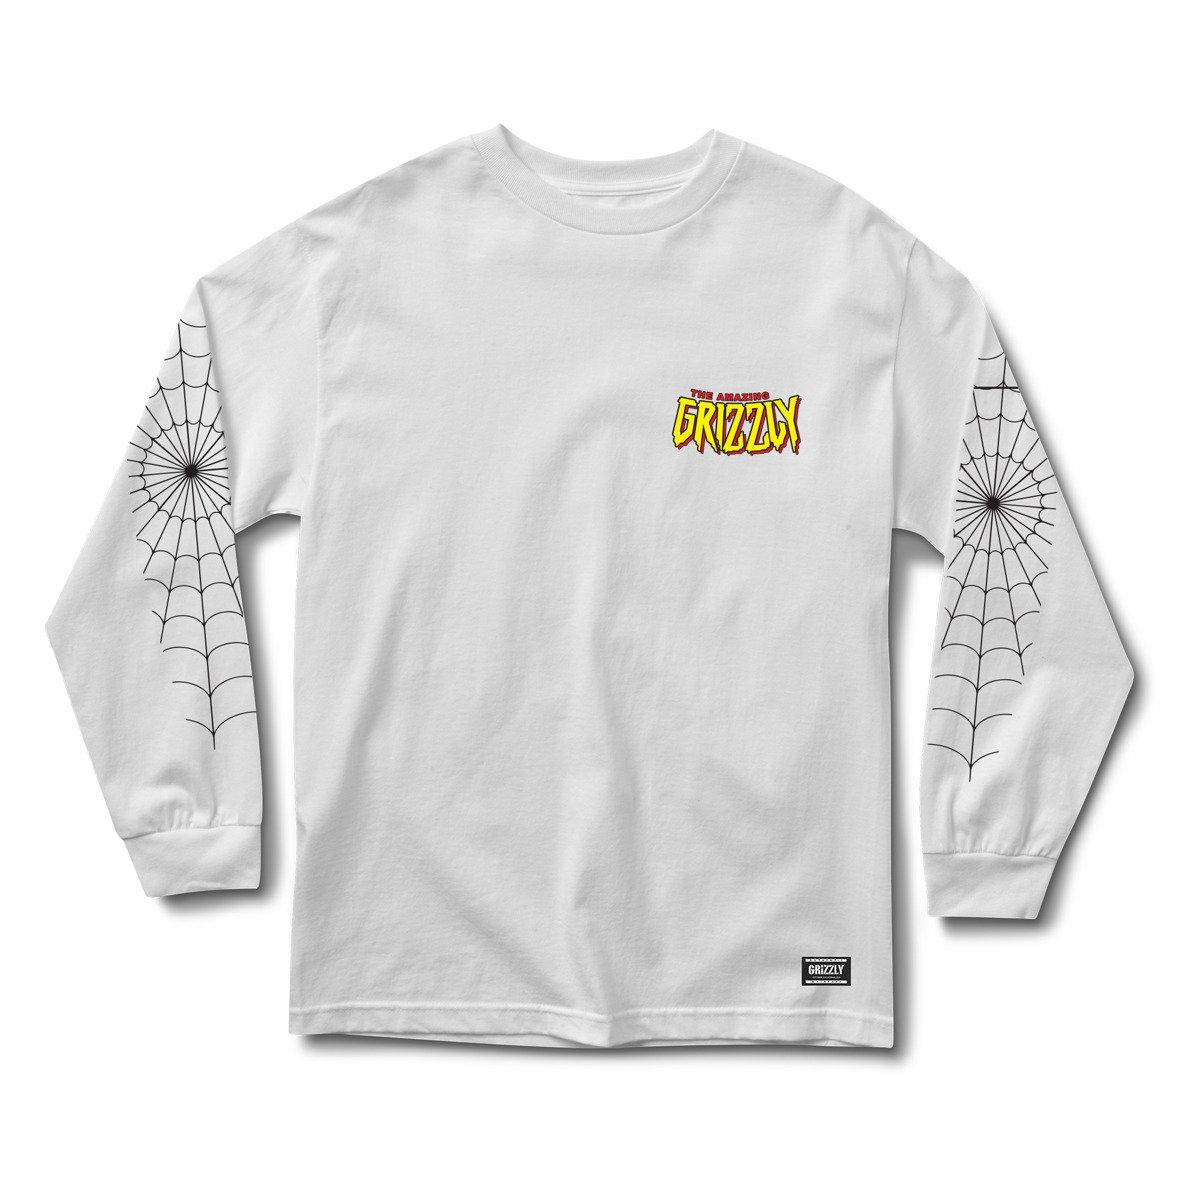 ef63b135e Marvel T Shirts At Kohls